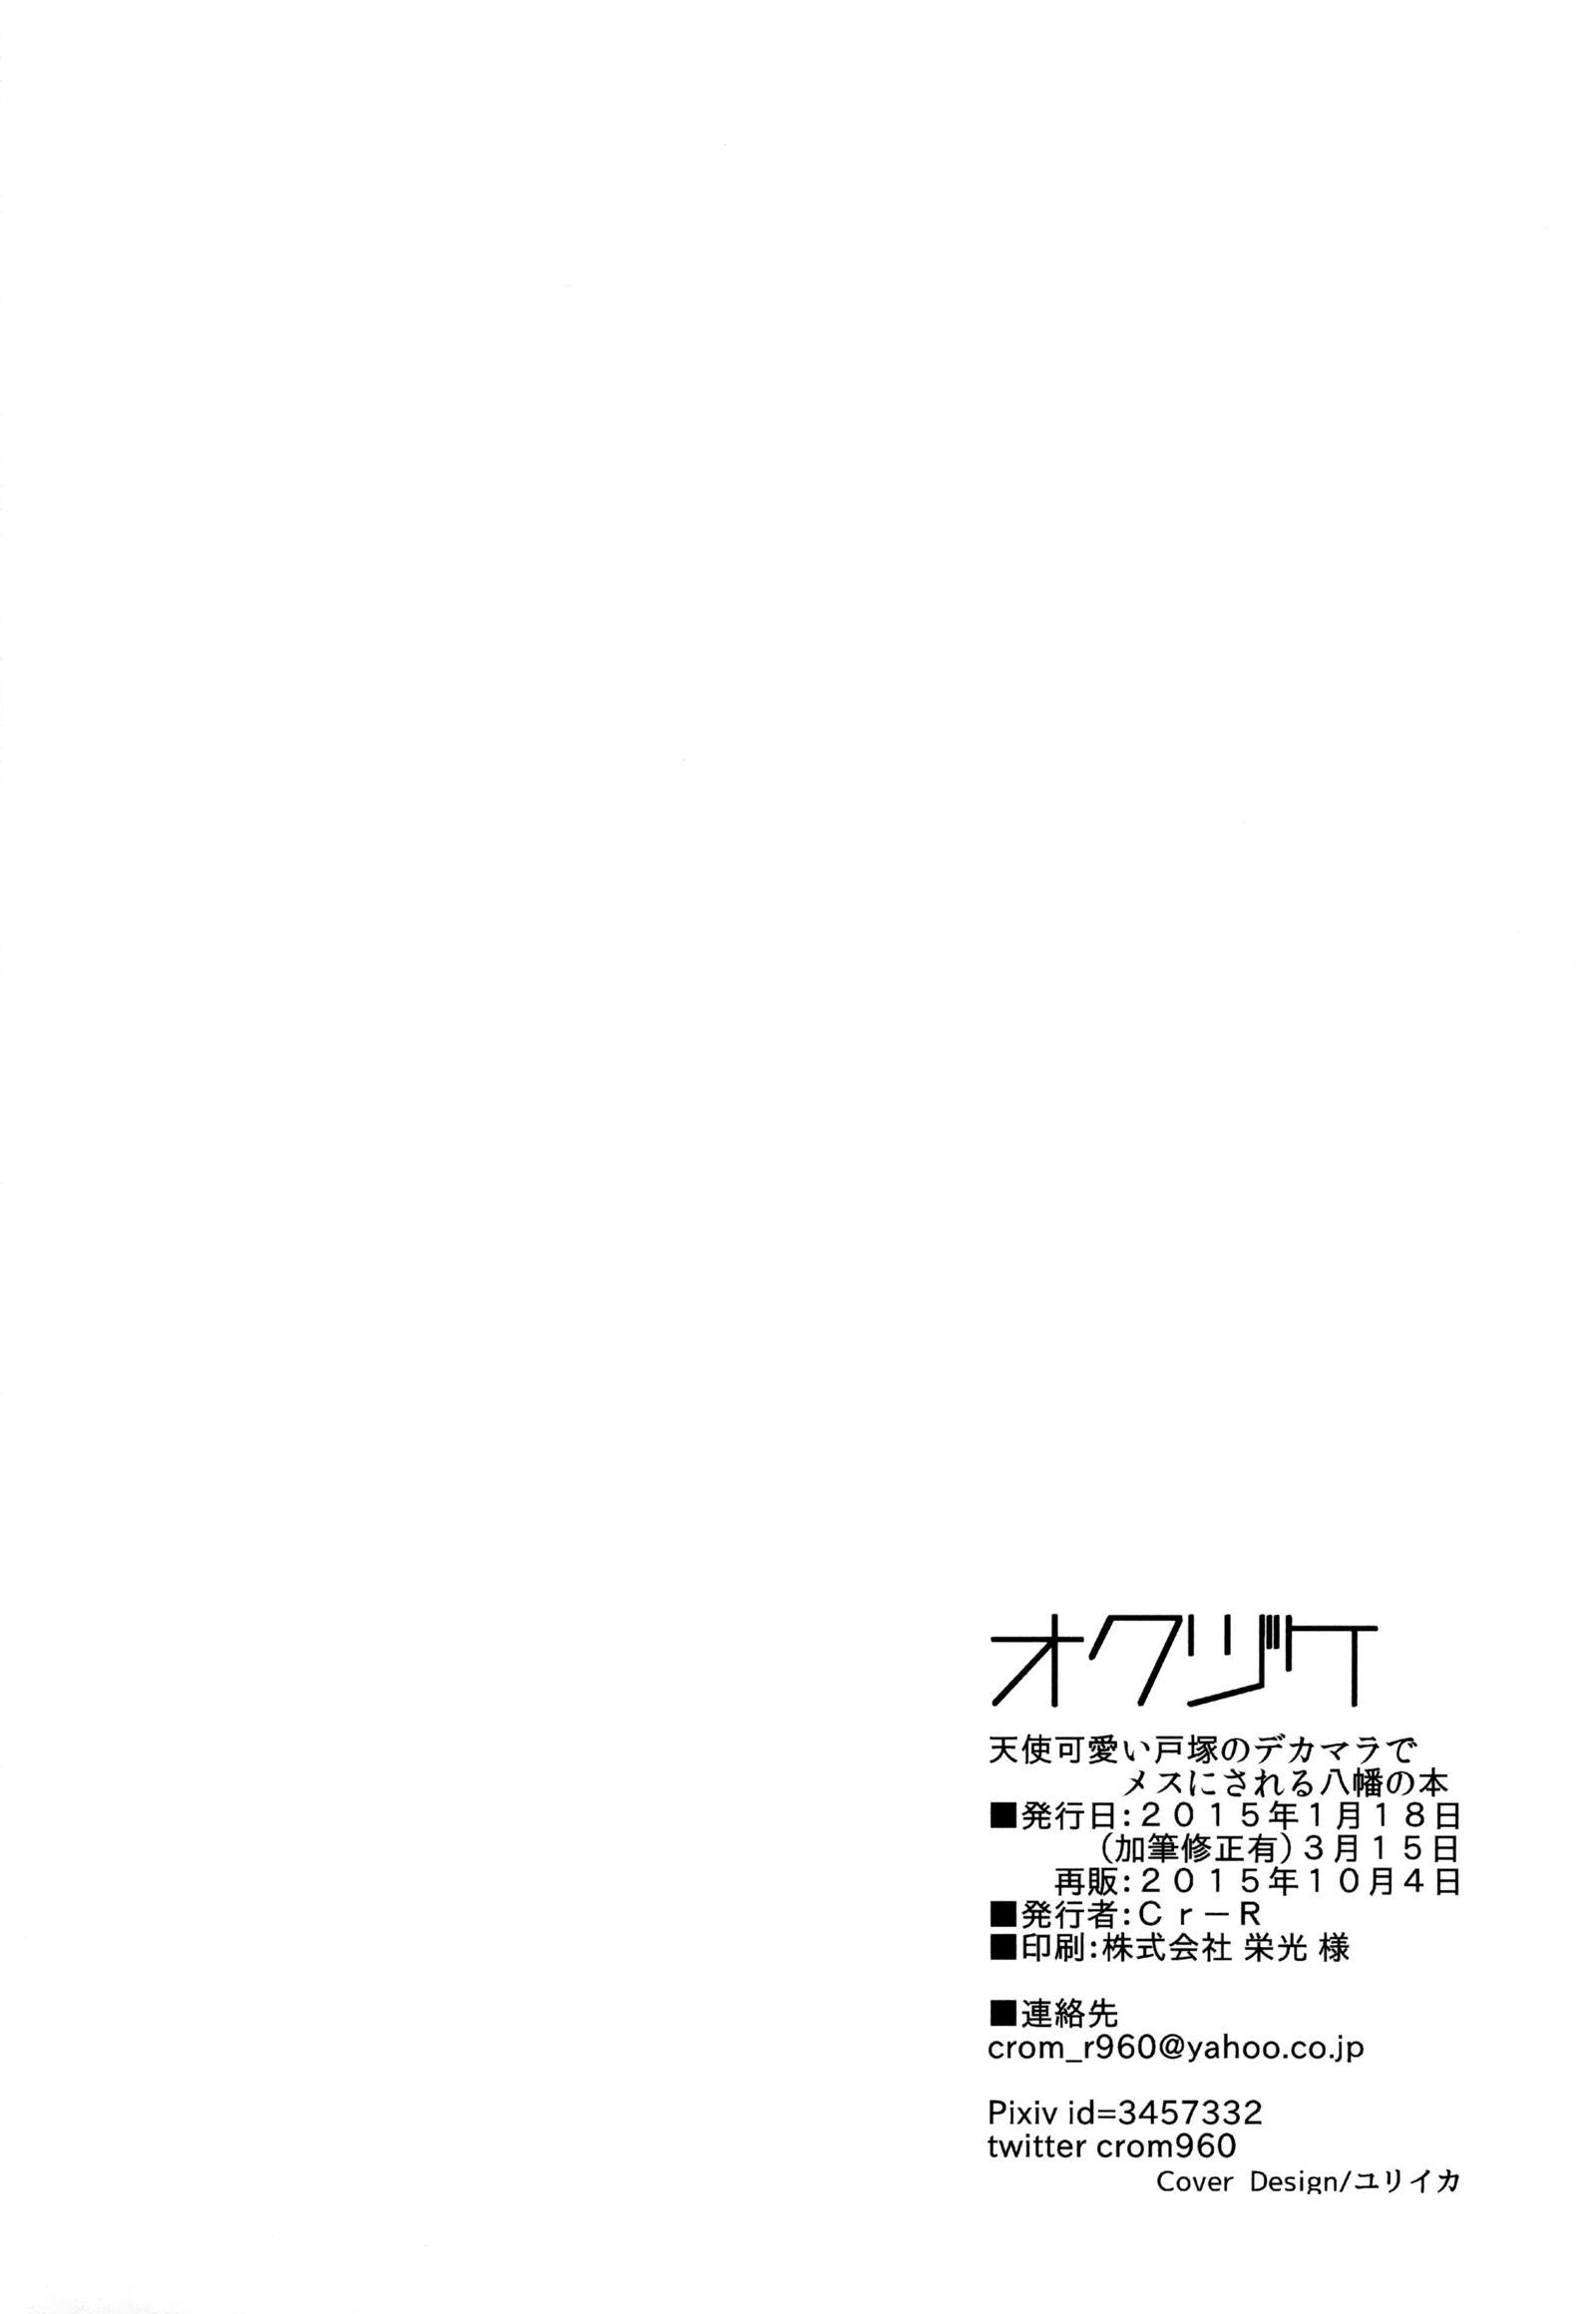 Tenshi Kawaii Totsuka no Dekamara de Mesu ni Sareru Hachiman no Hon. | Cute Angel Totsuka Turns Hachiman into His Bitch with His Elephant Cock 28